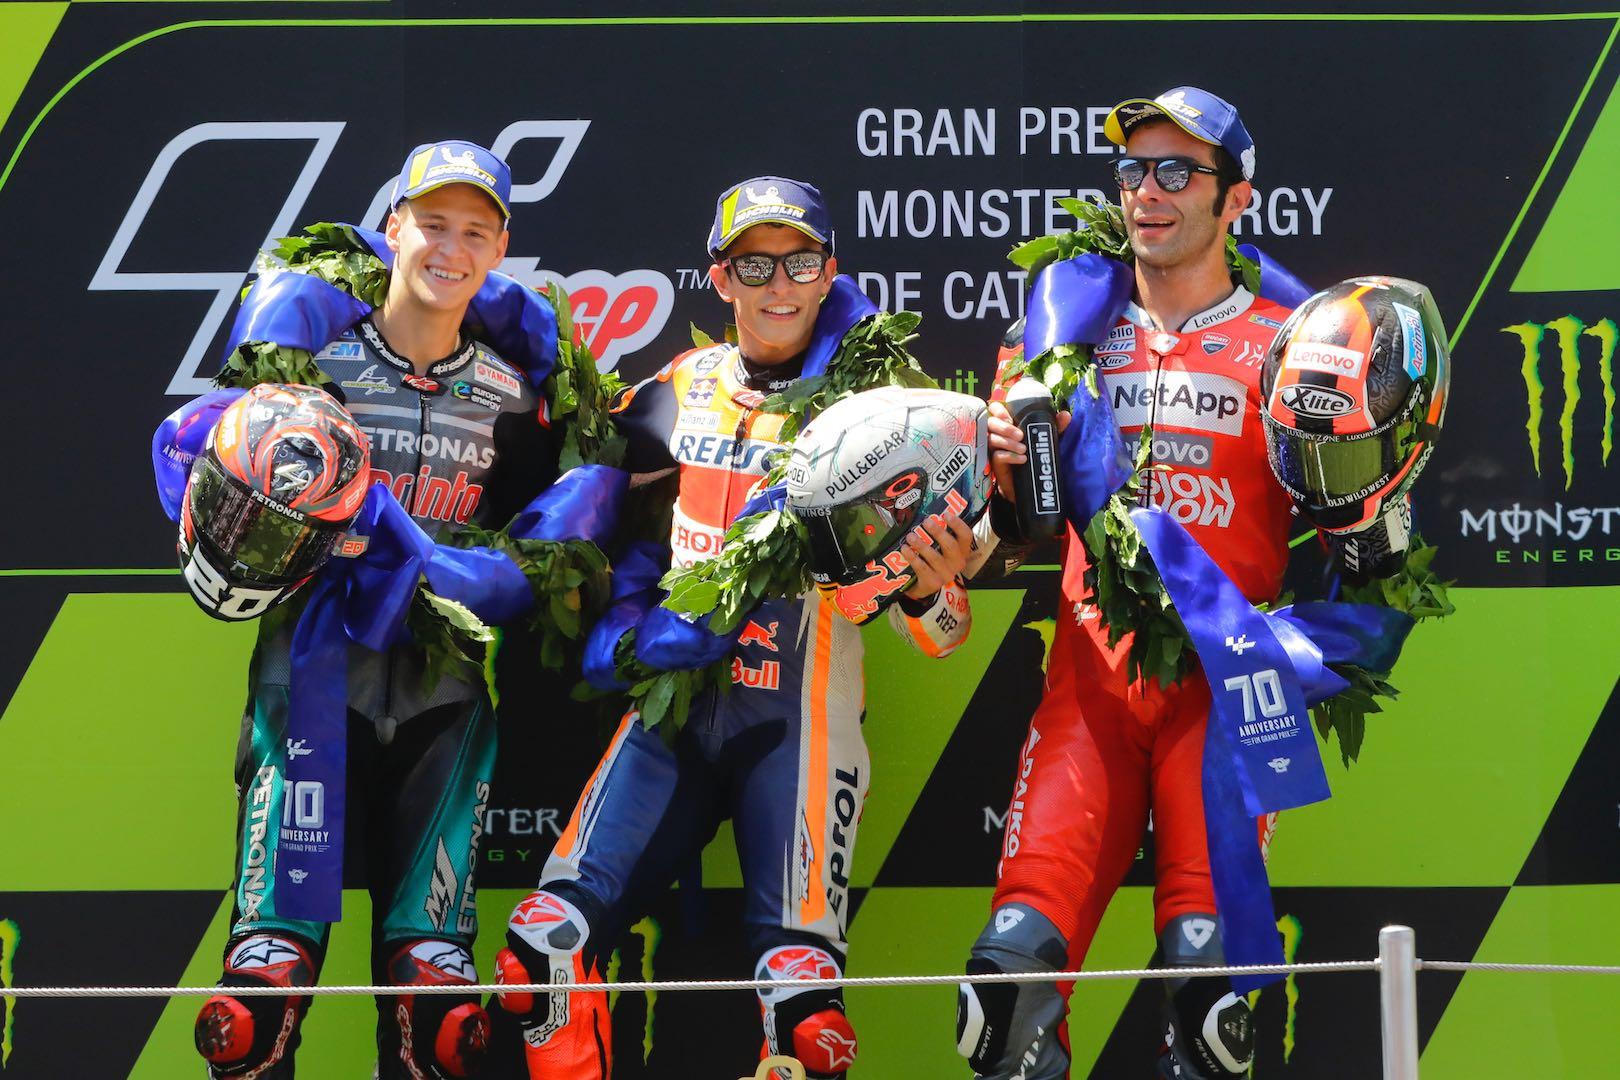 Podium finishers at Catalan GP 2019